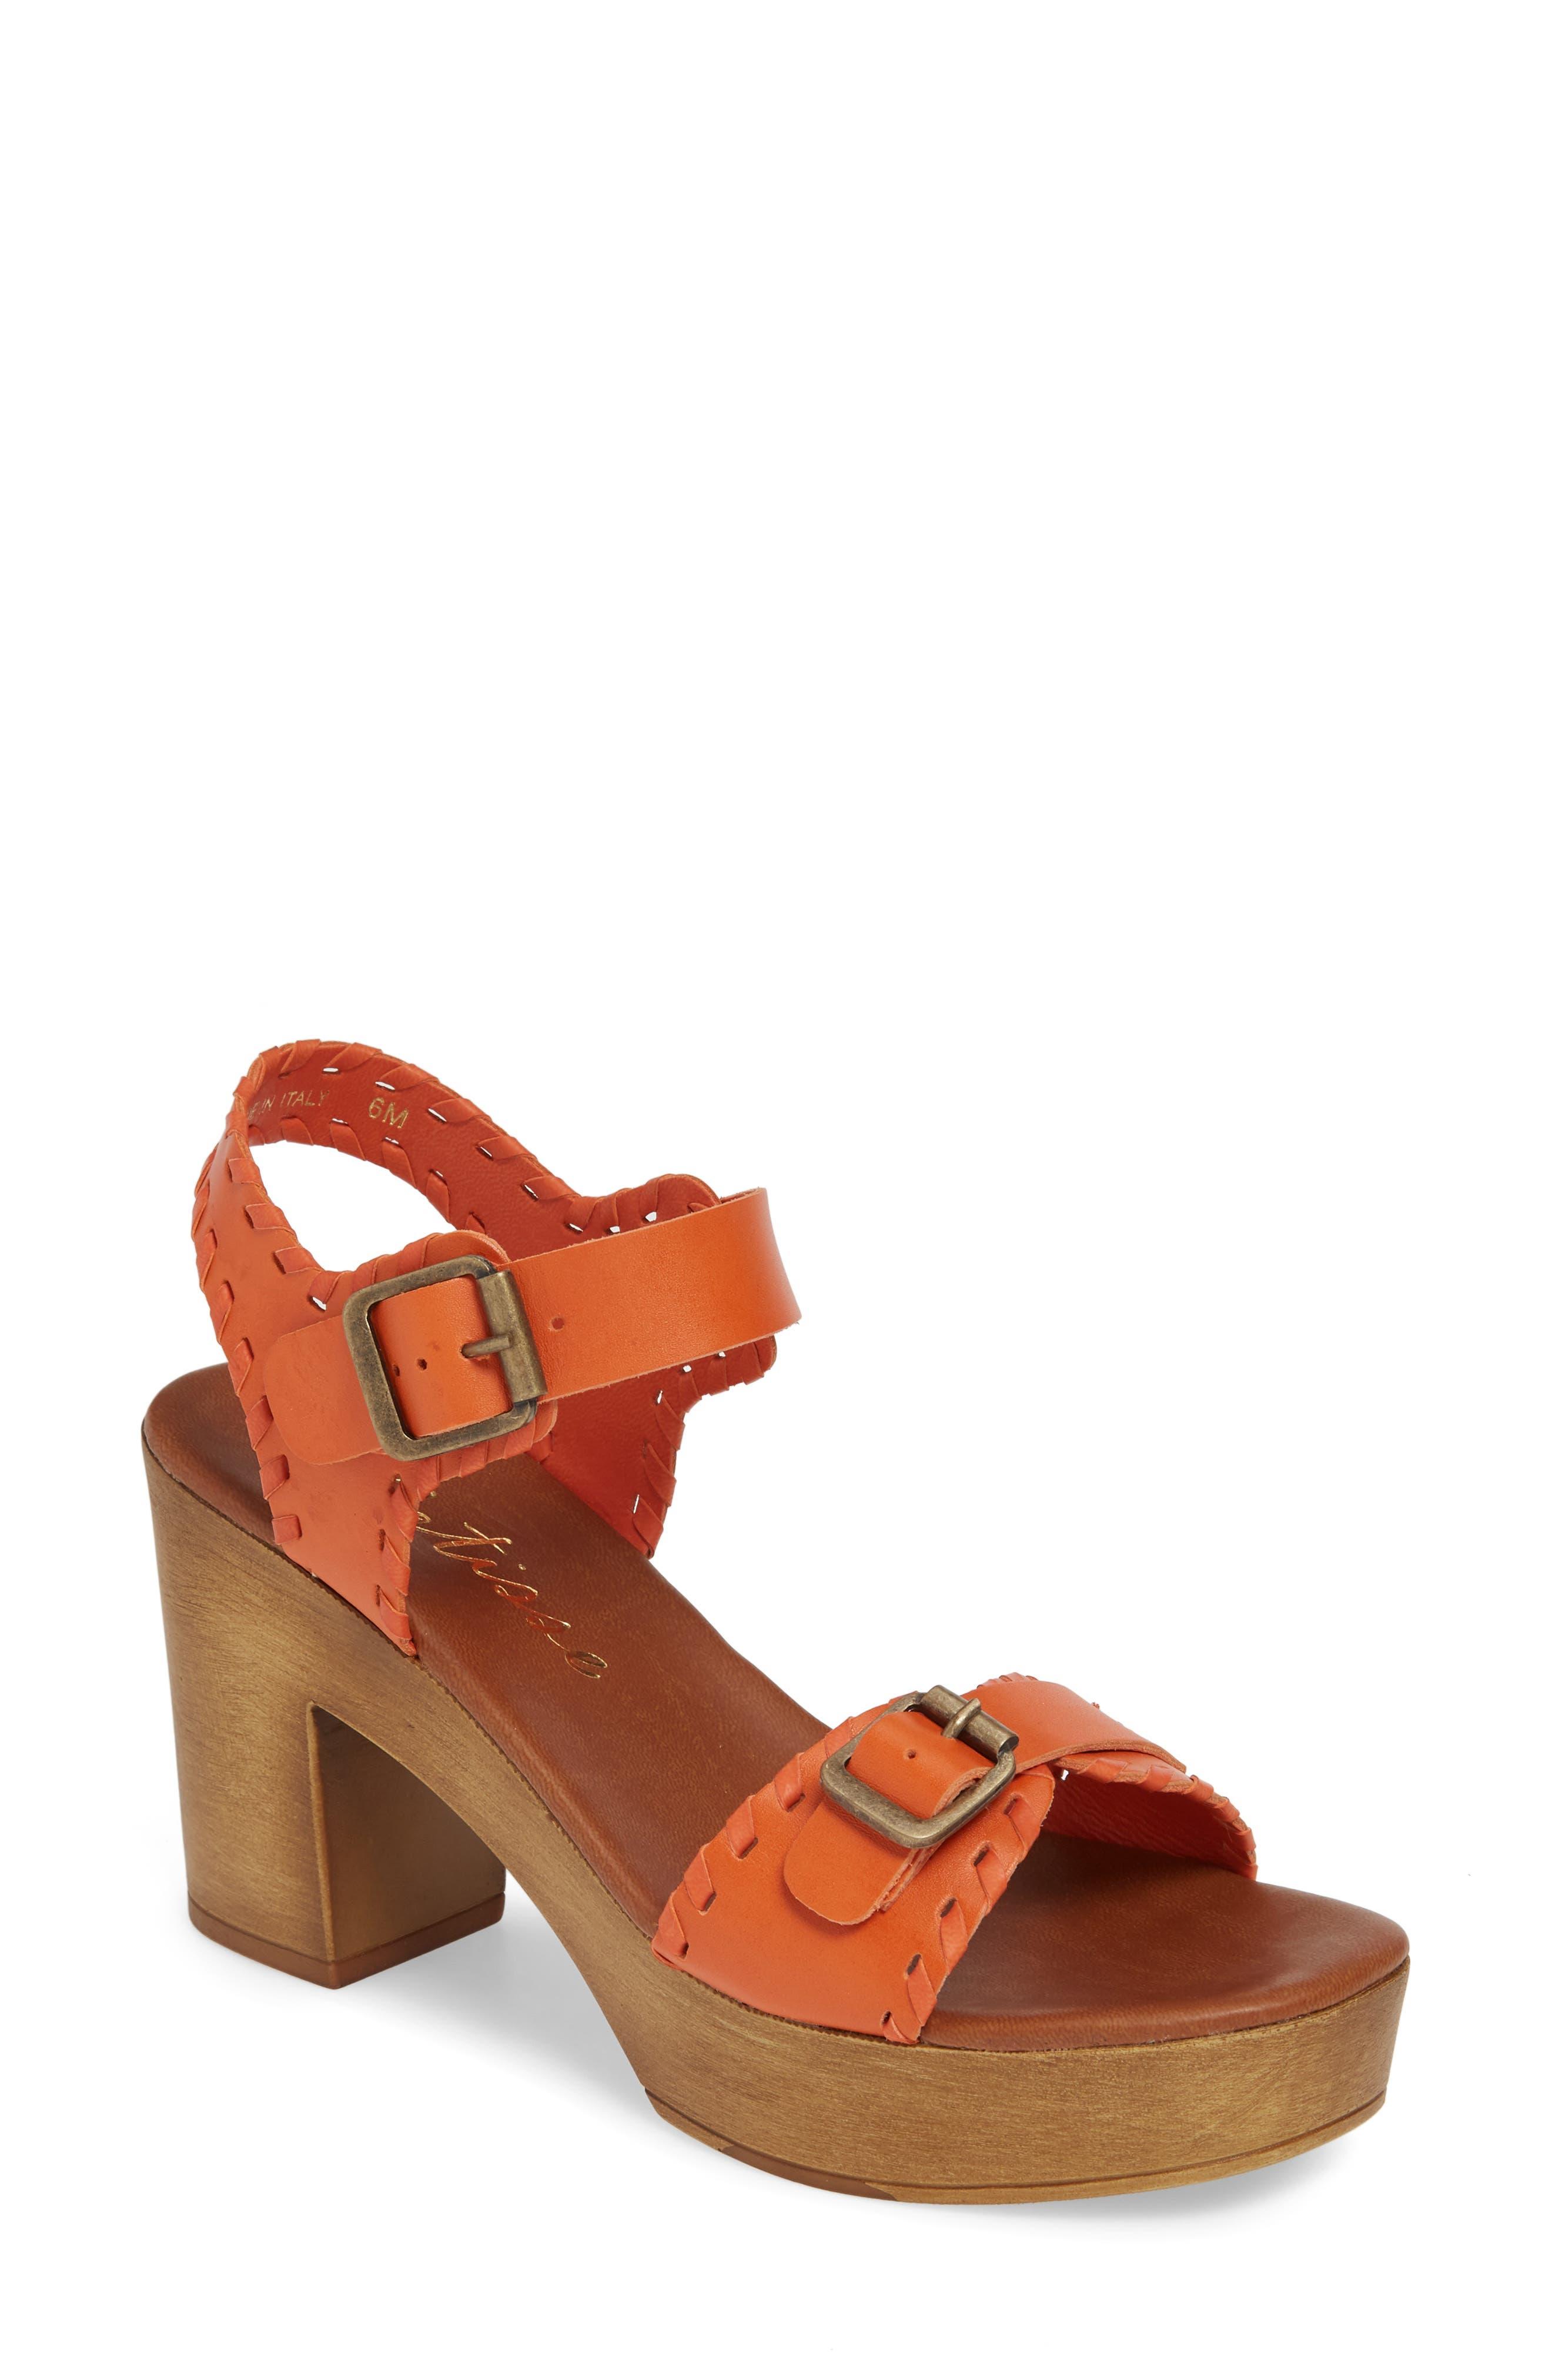 Matisse Twiggy Platform Sandal, Orange